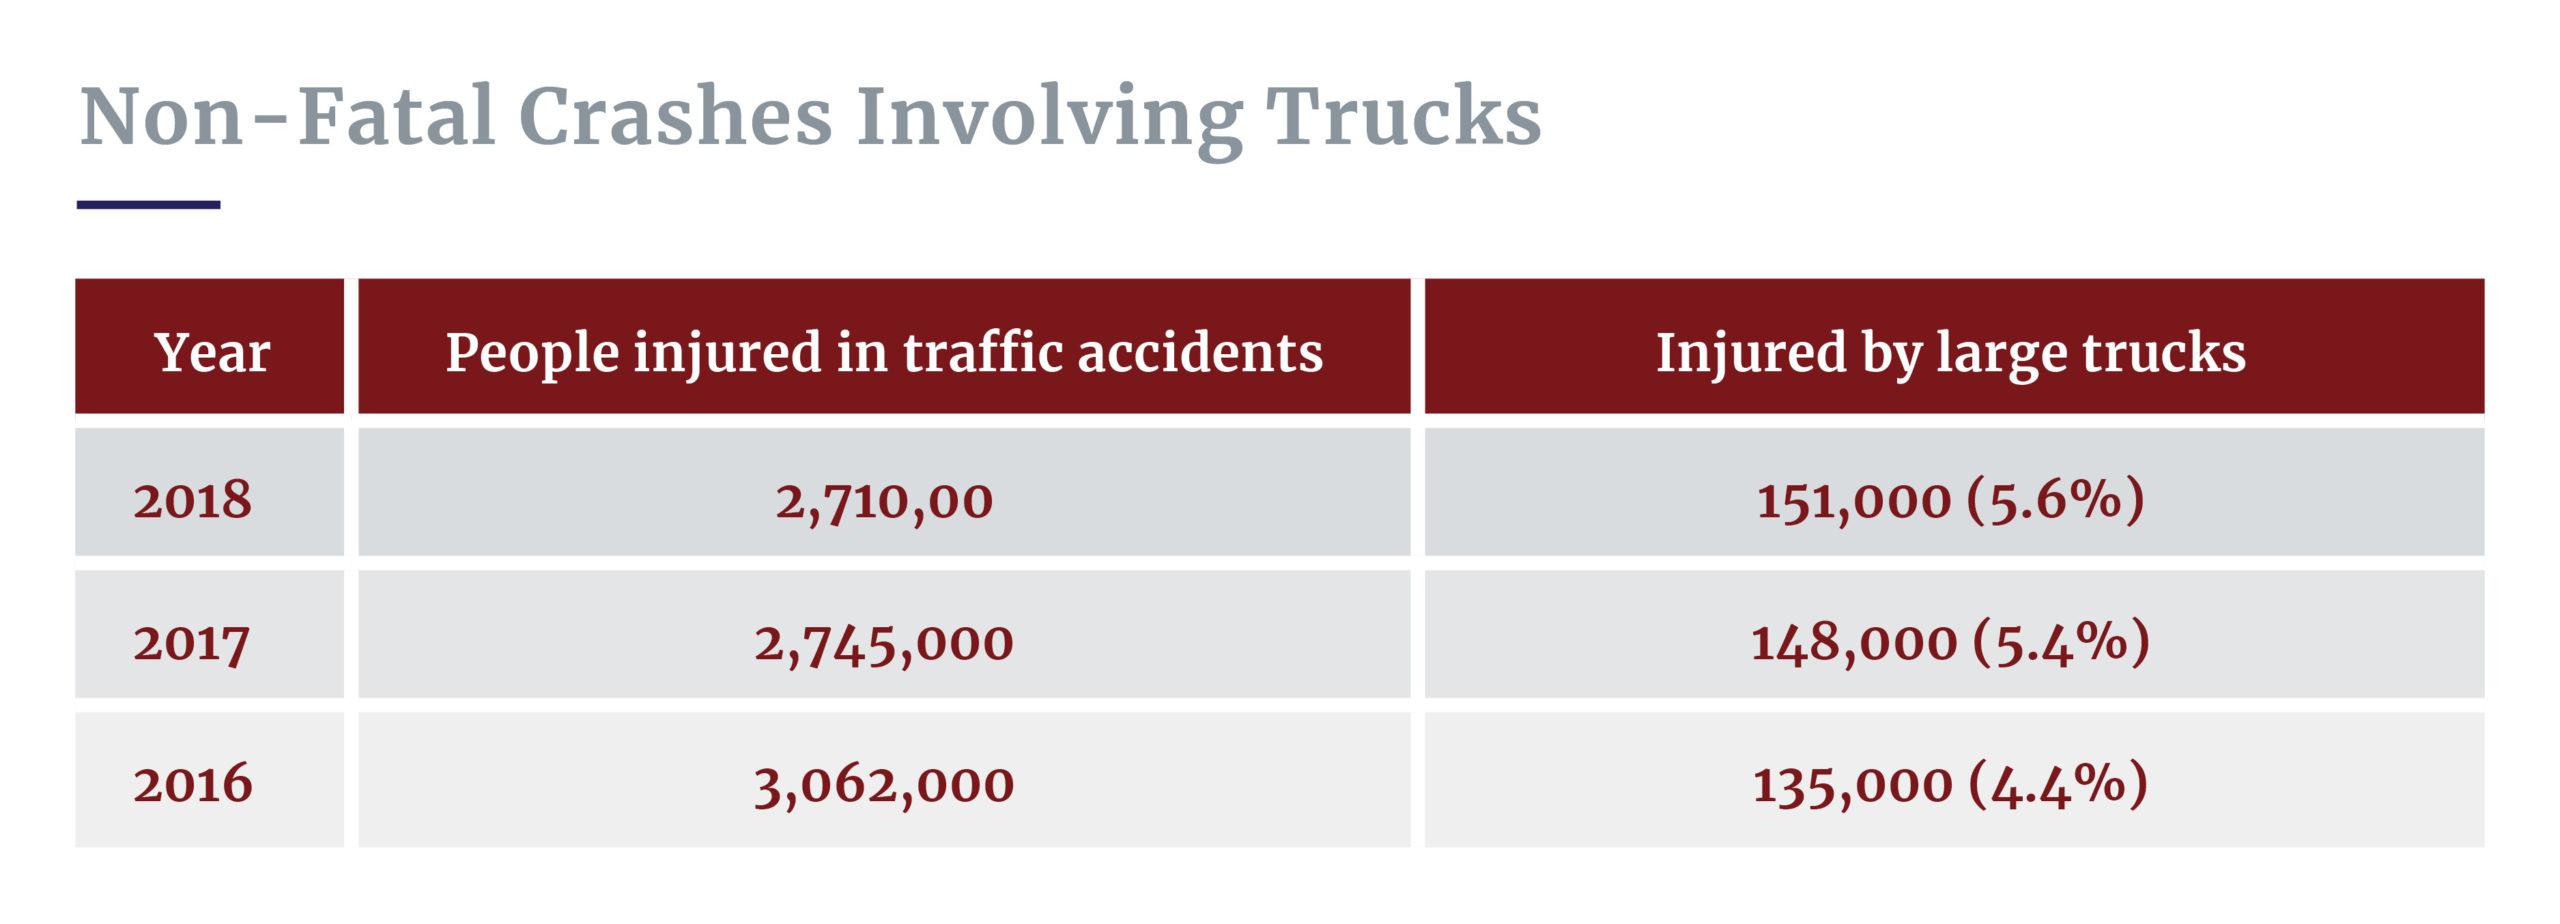 Non-fatal truck crashes